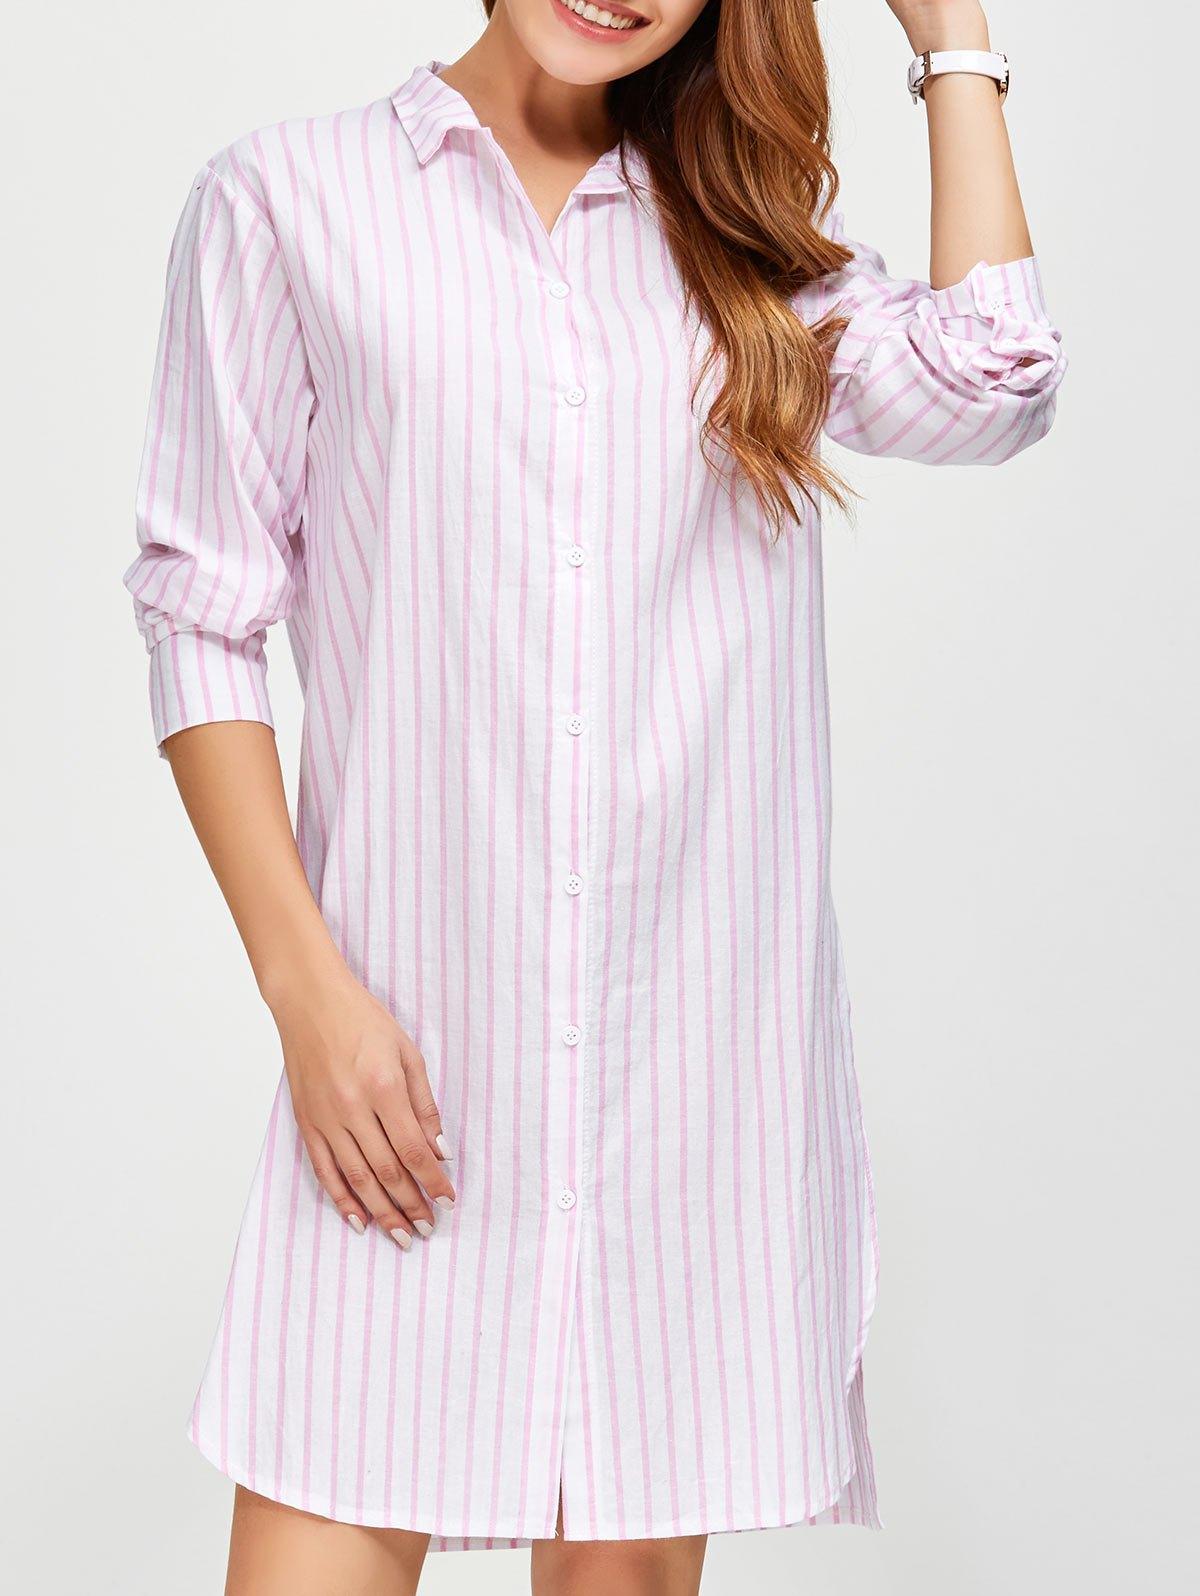 Long Striped Loose Slit Shirt